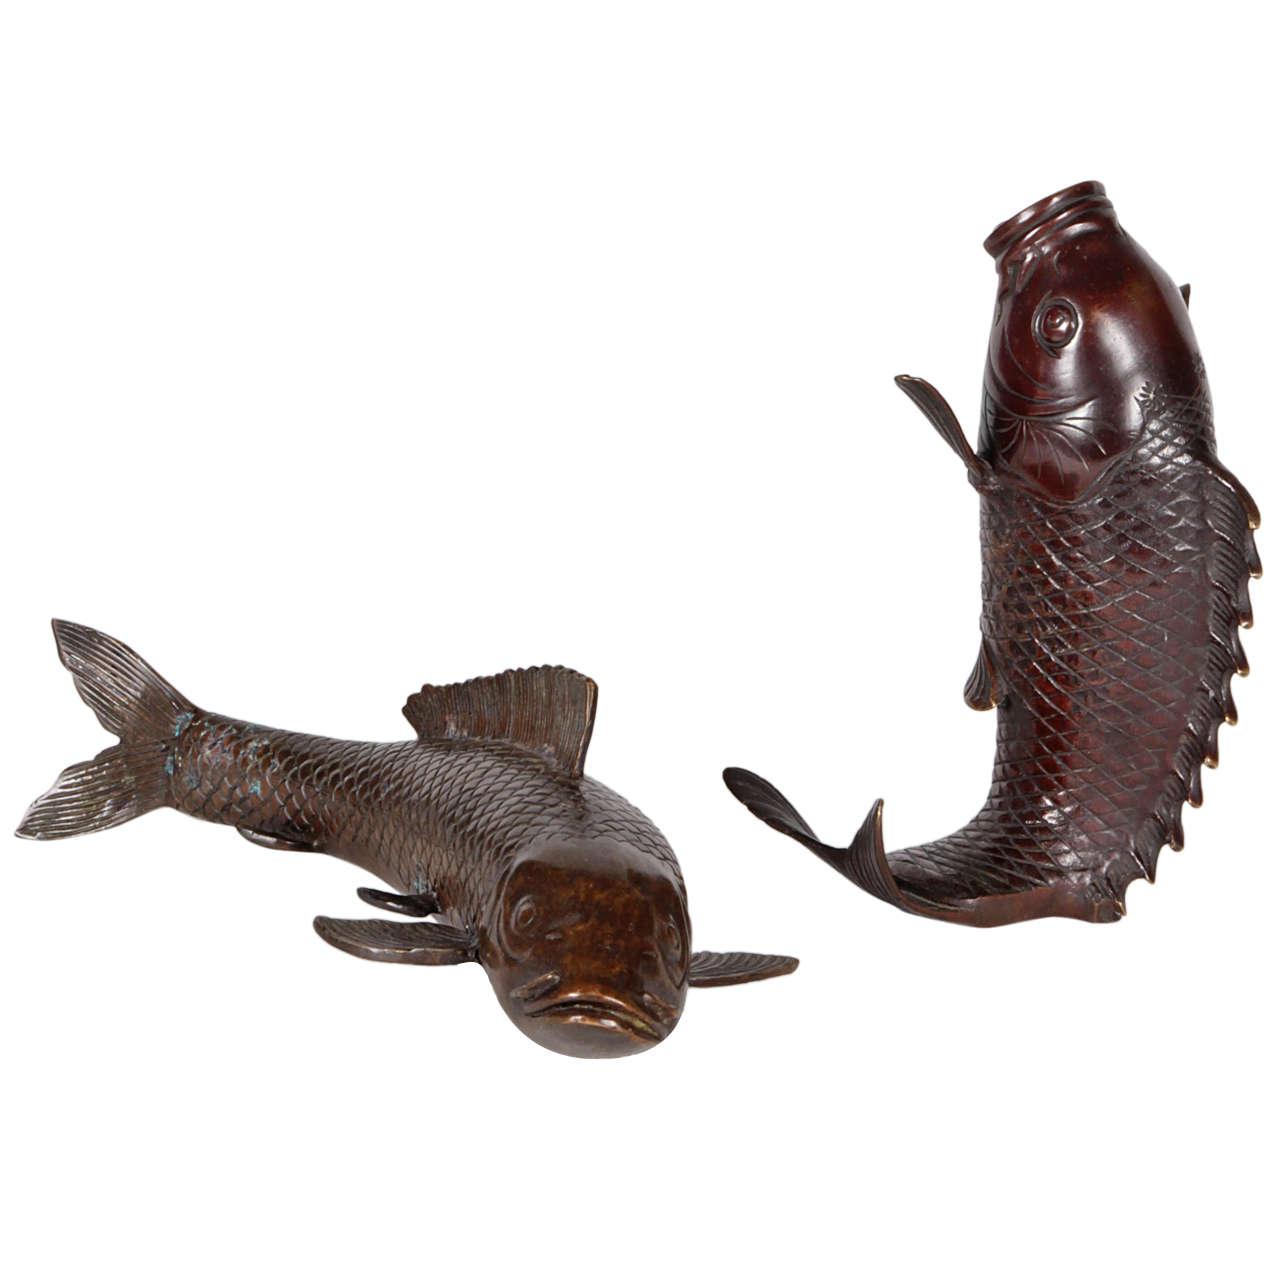 Japanese meiji period koi fish bronze sculpture and vase for Koi fish statue